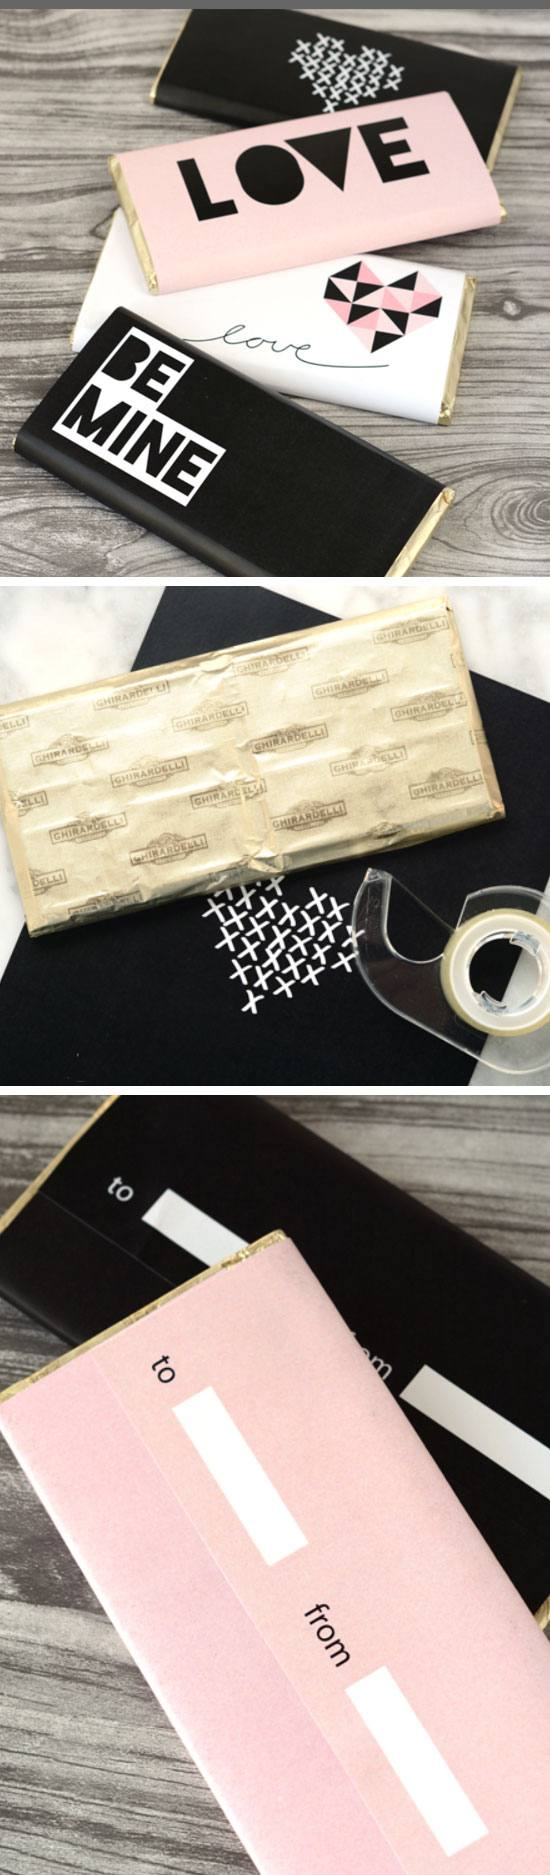 Retro Printable Valentine's Day Chocolate Bar Wraps.